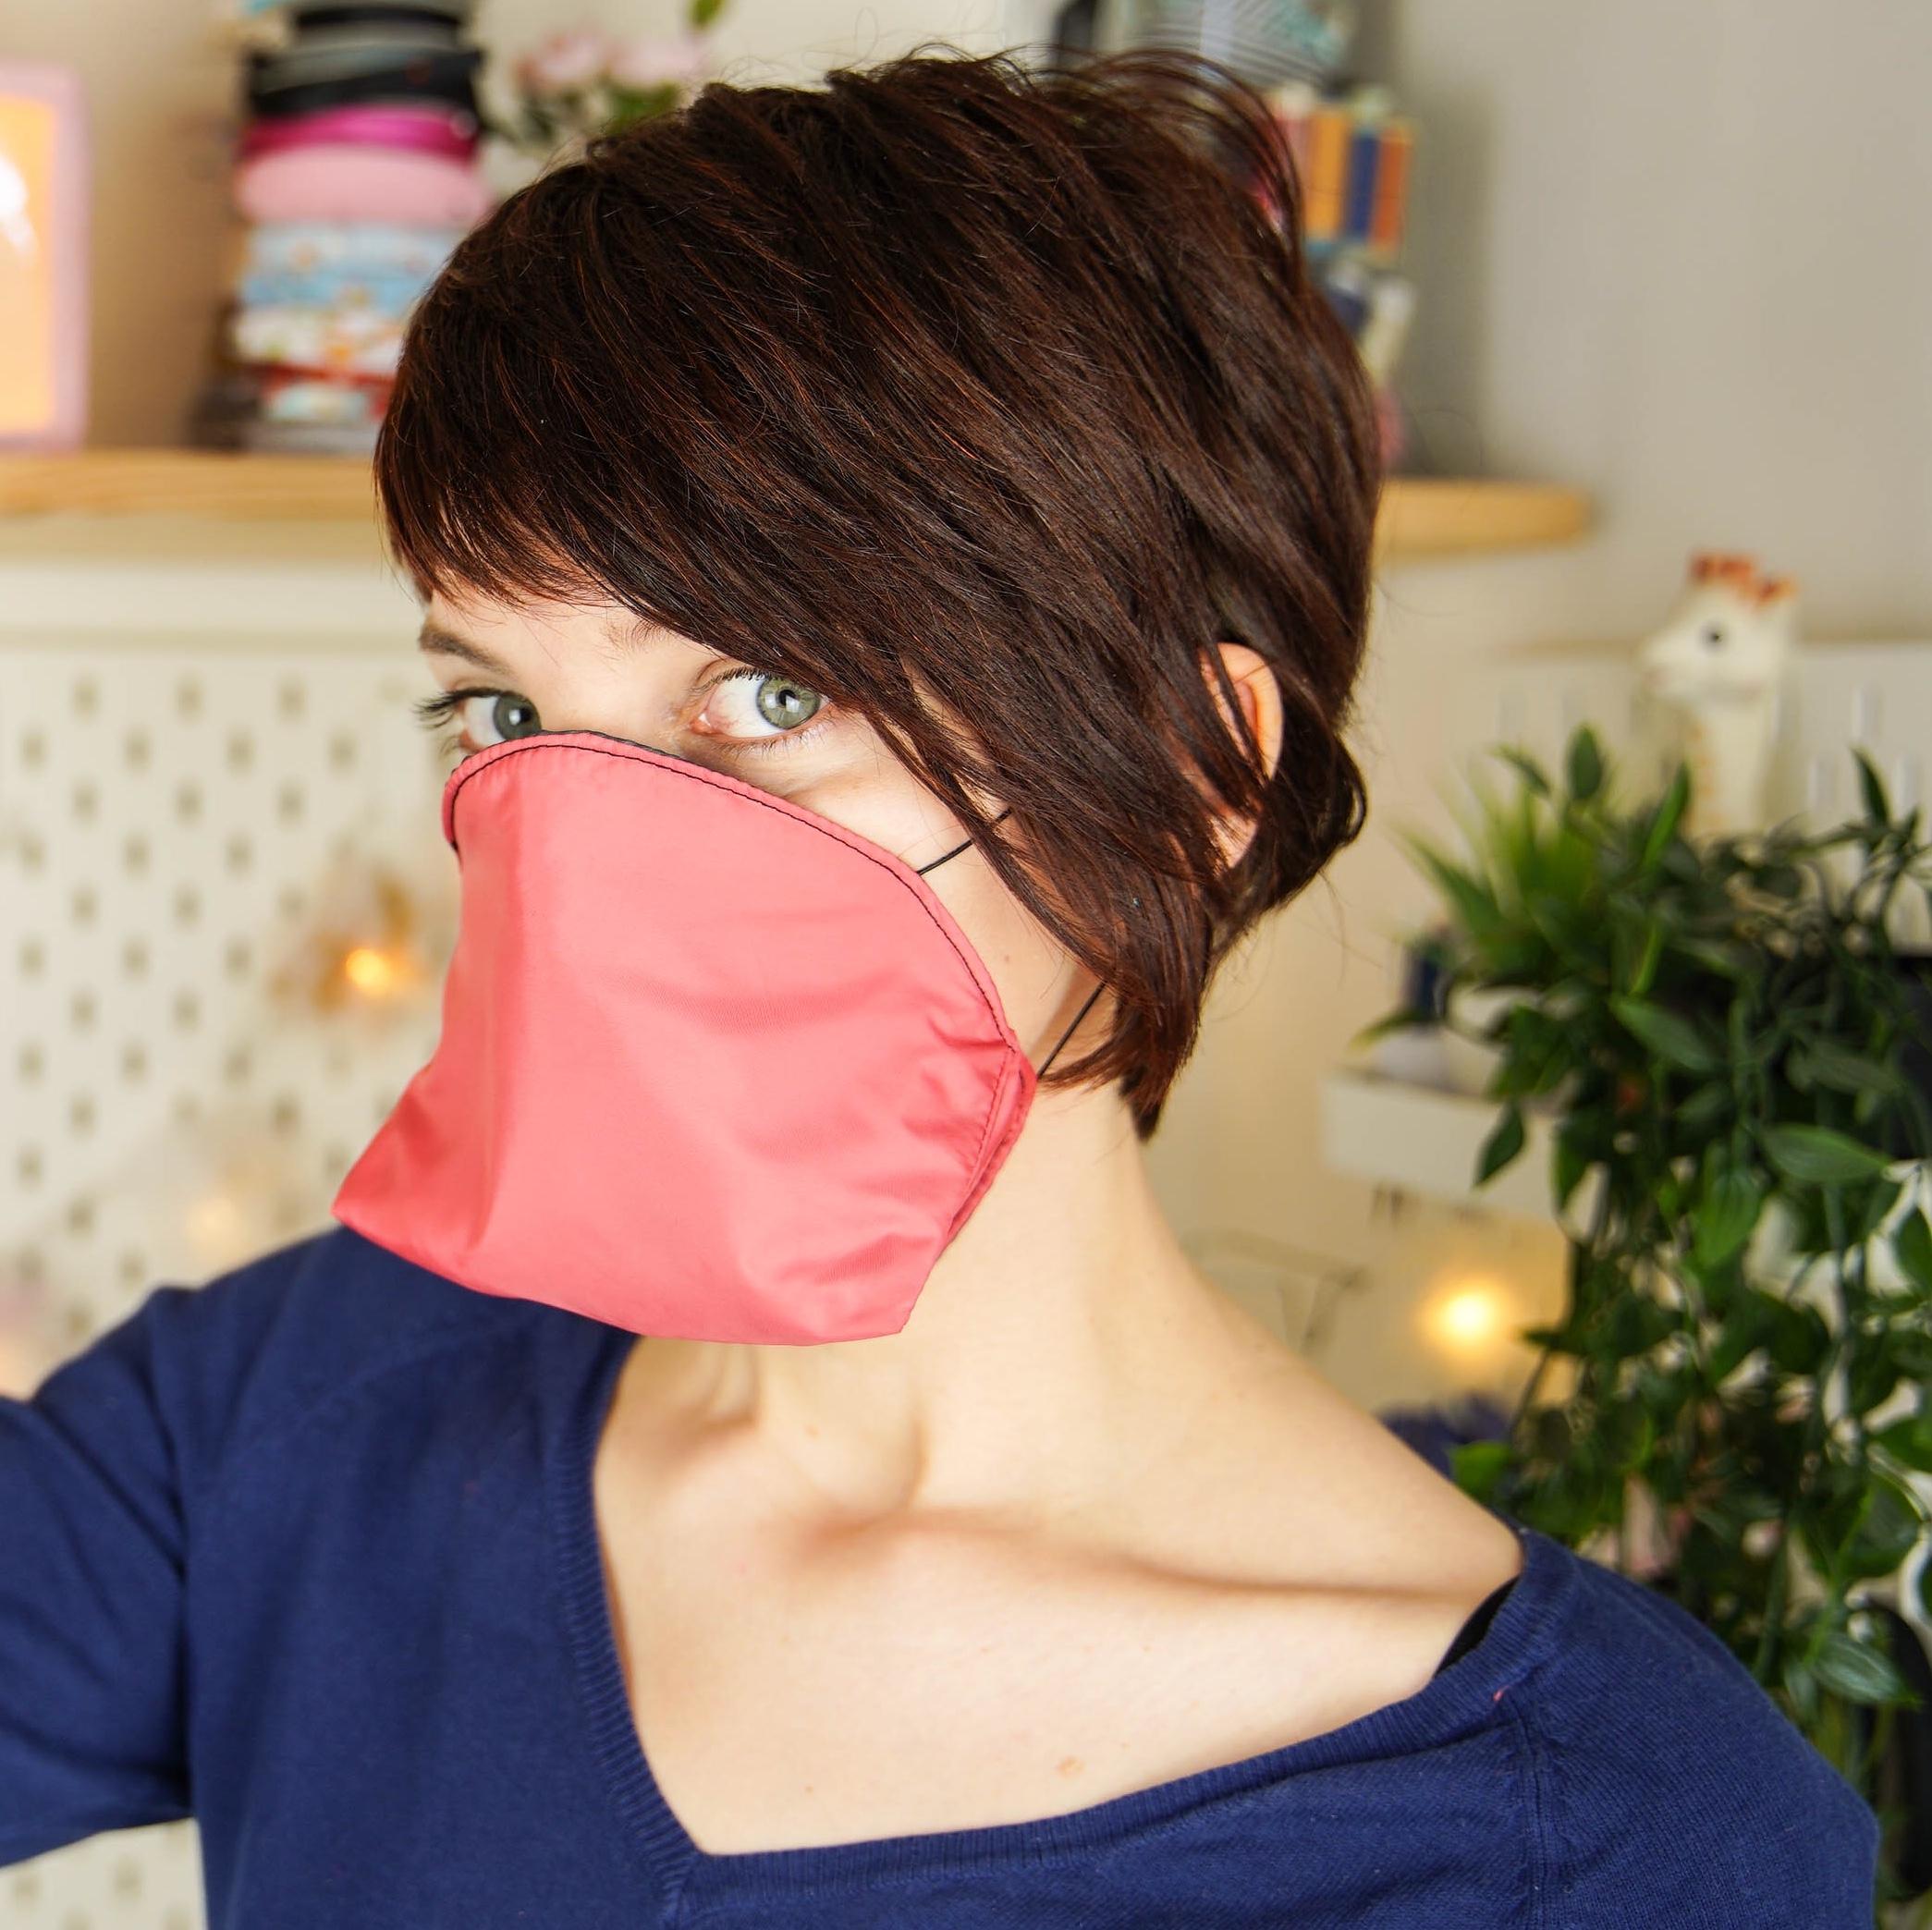 Tuto Couture Masque En Tissu Canard Respiratoire Afnor destiné Masque Canard À Imprimer